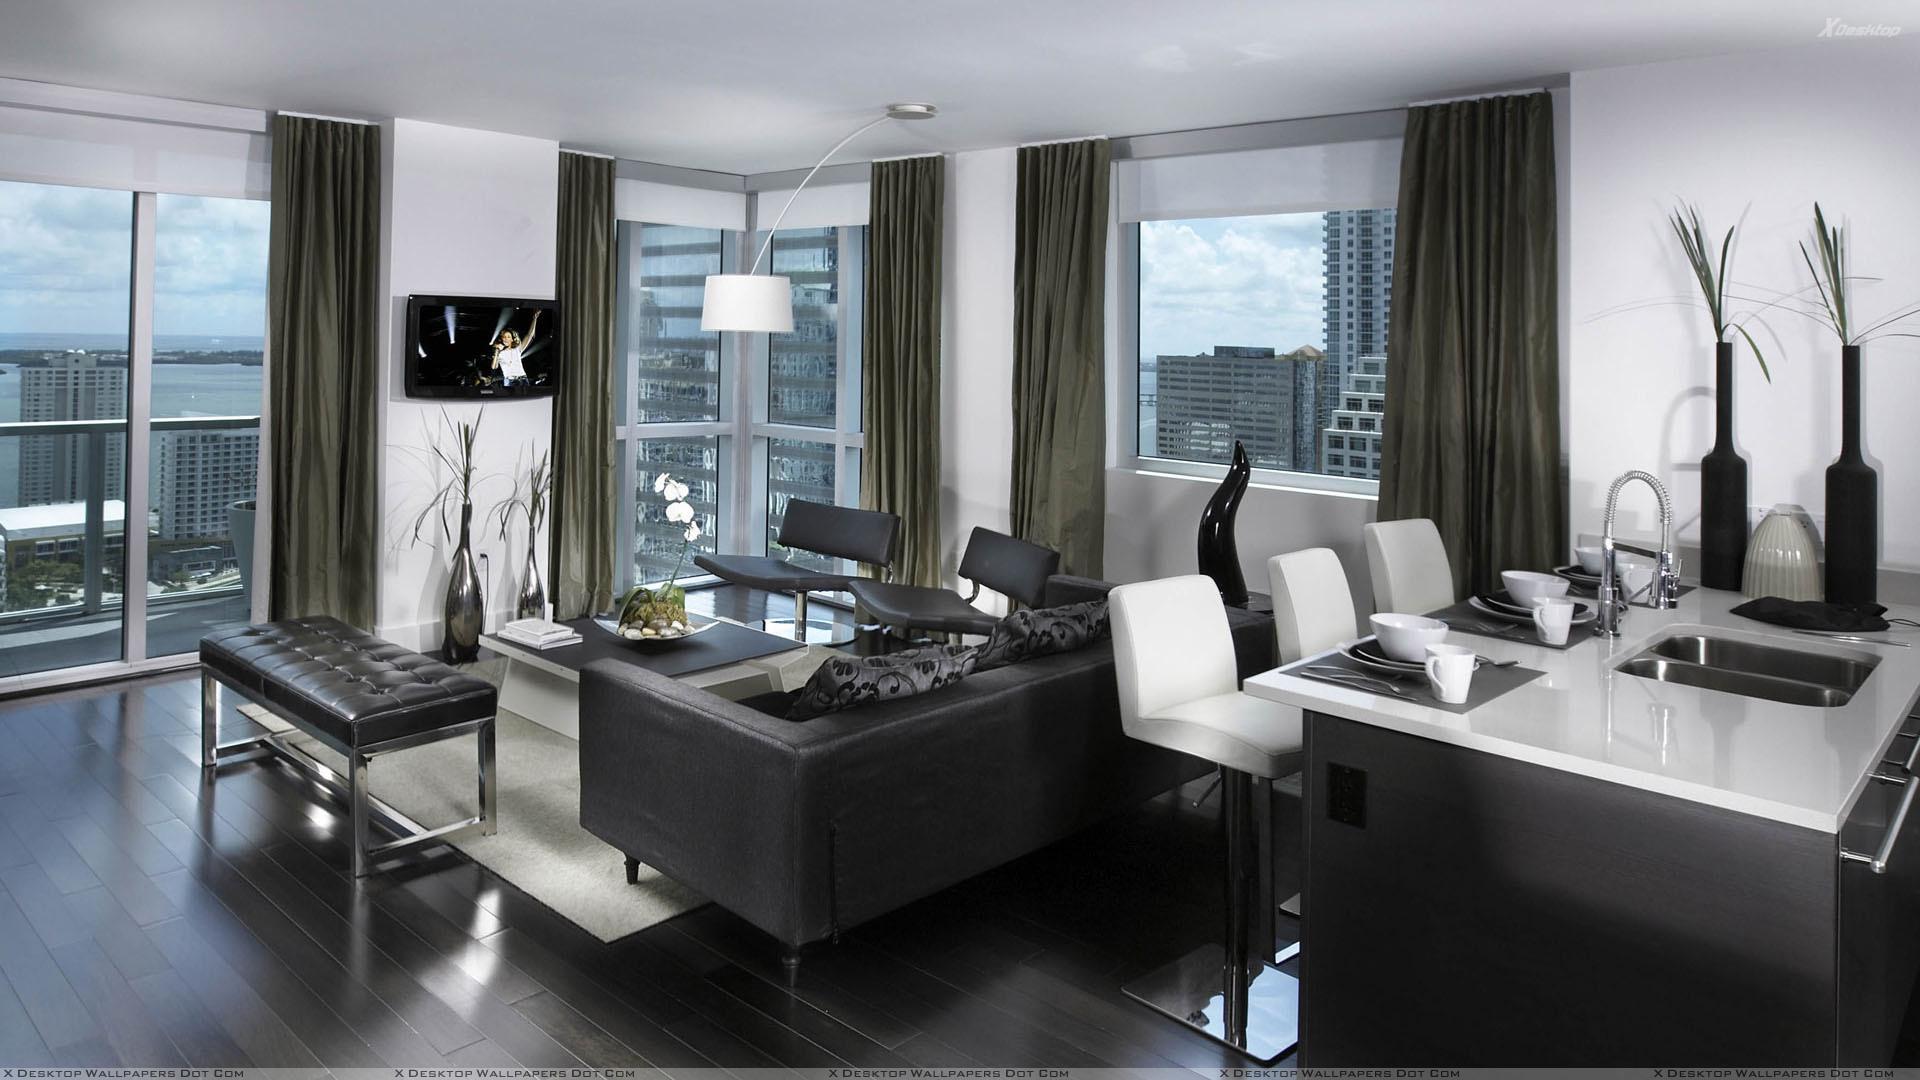 image - black-and-white-nice-apartment-interior | dumbledore's